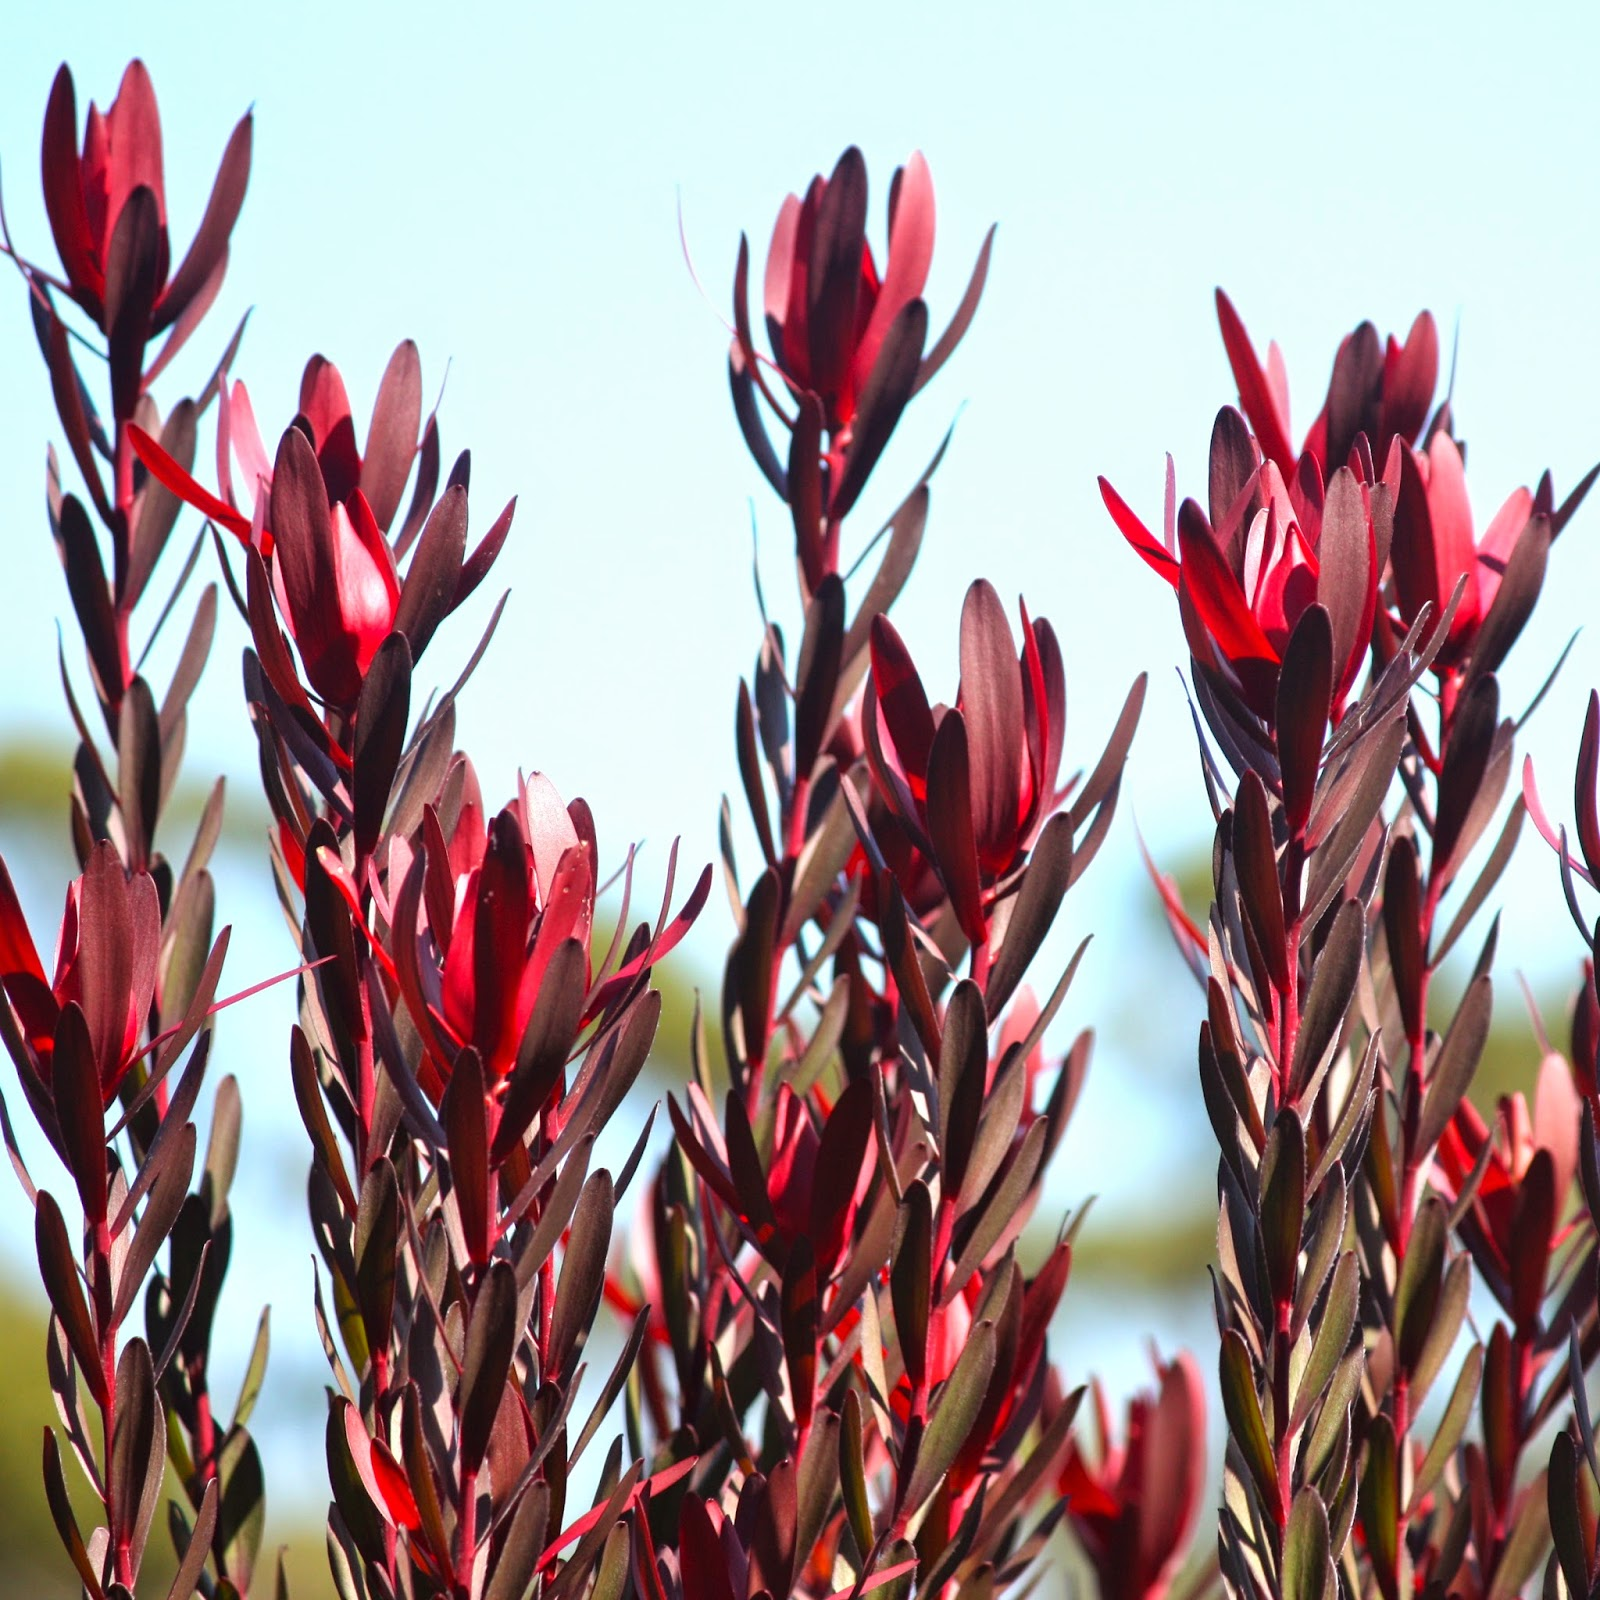 swallows nest farm leucadendron love. Black Bedroom Furniture Sets. Home Design Ideas